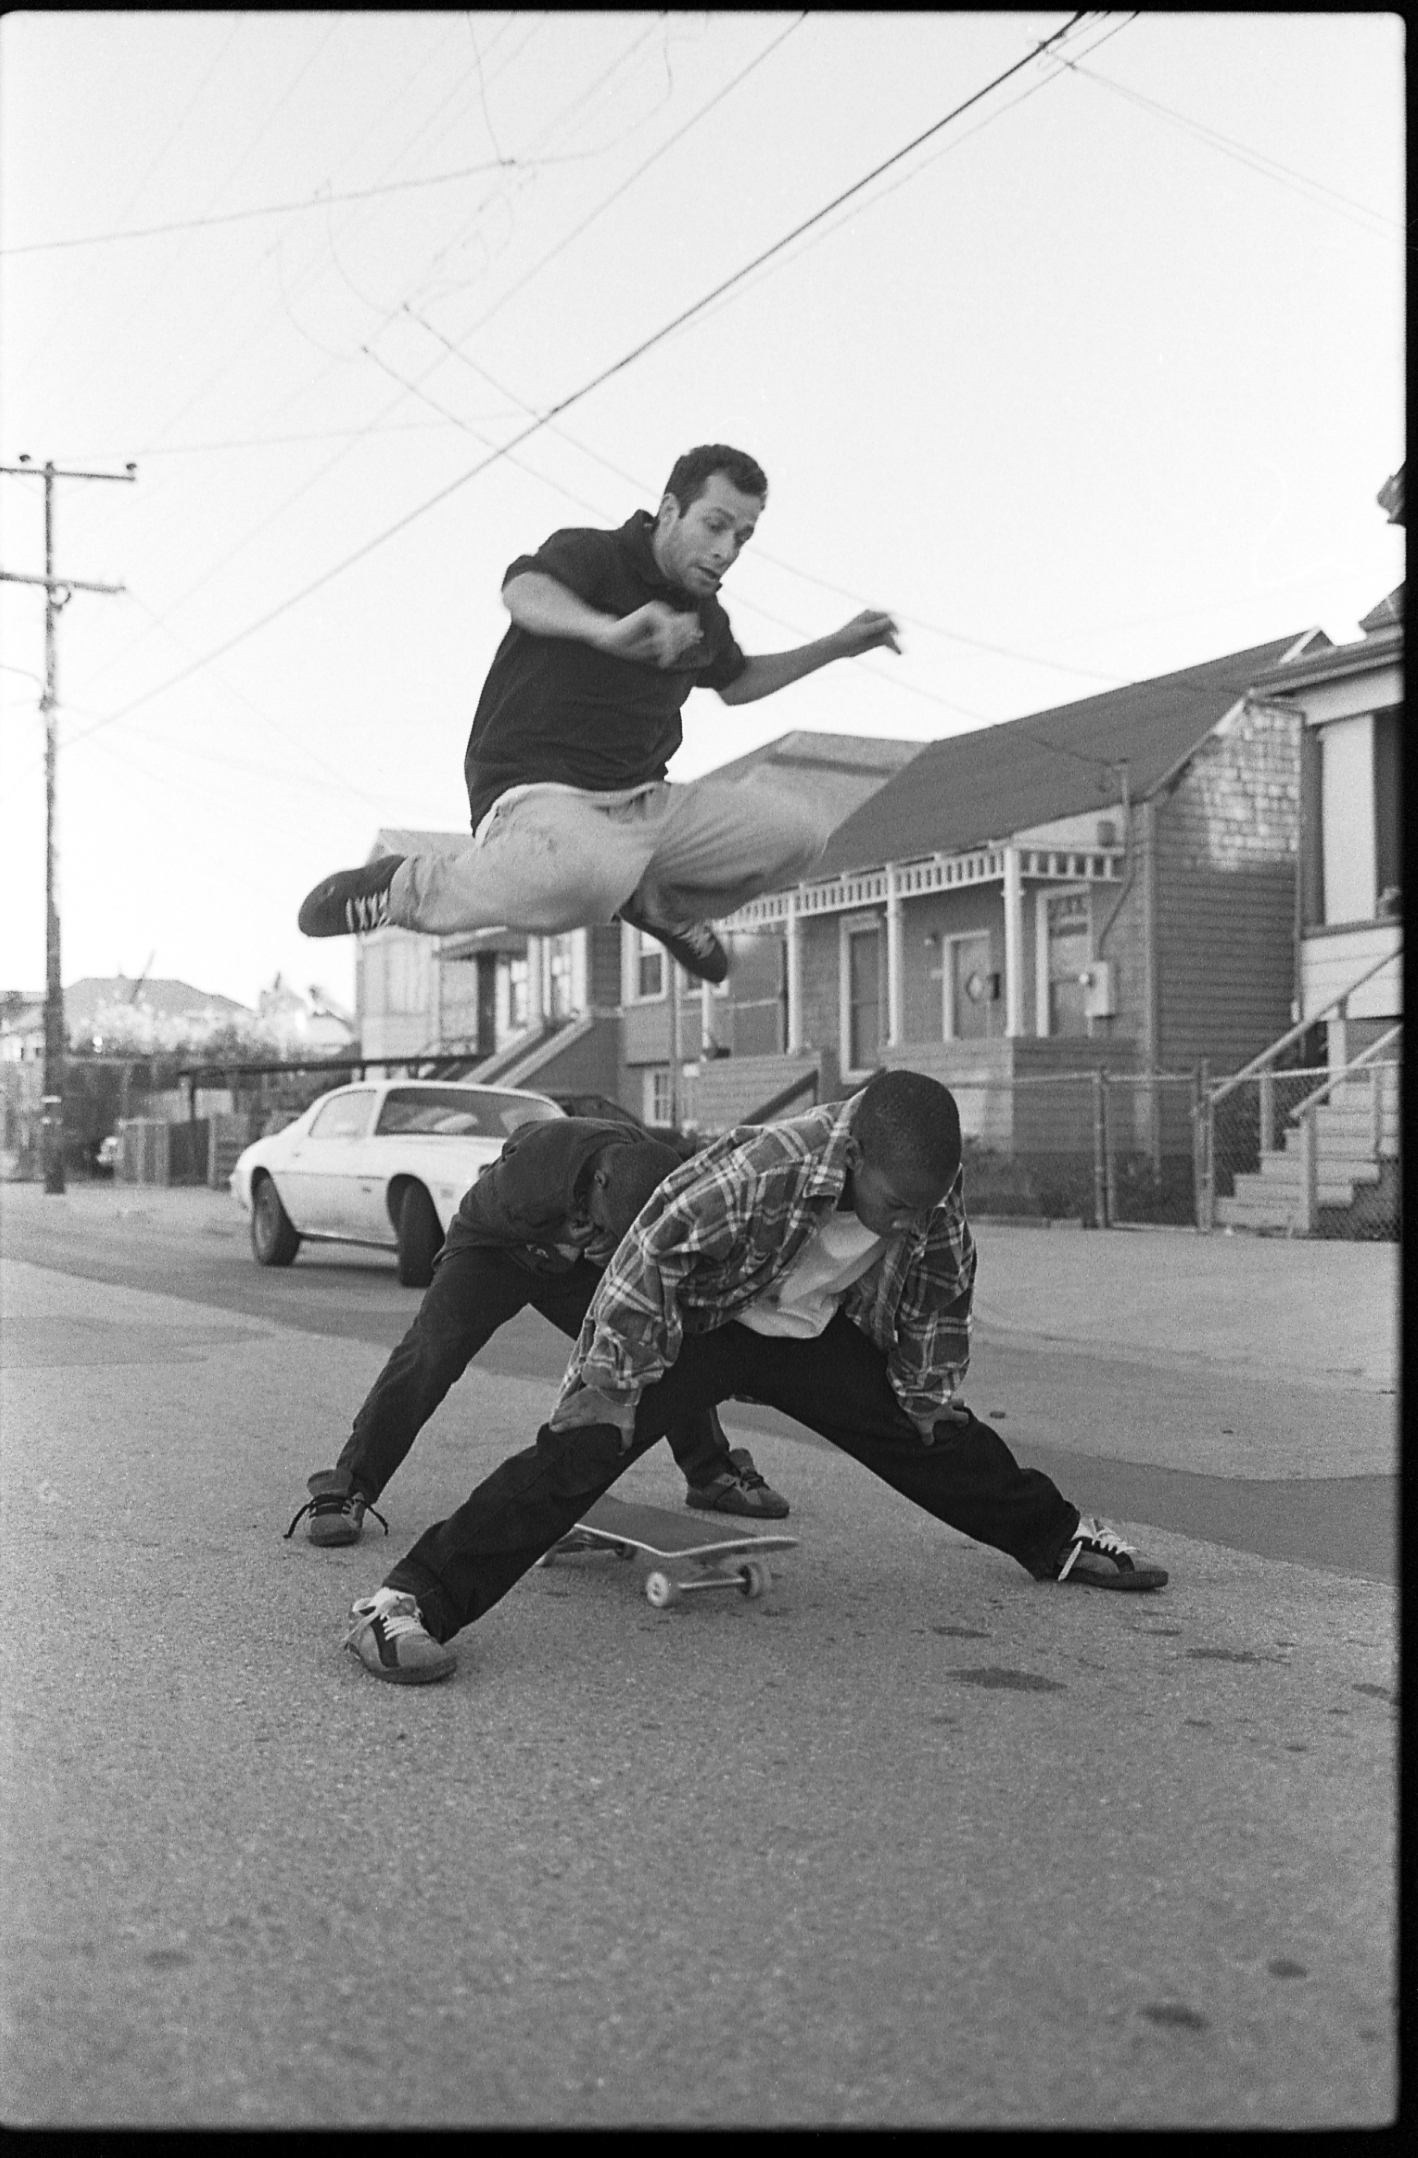 Mark Gonzales, Oakland, 1996